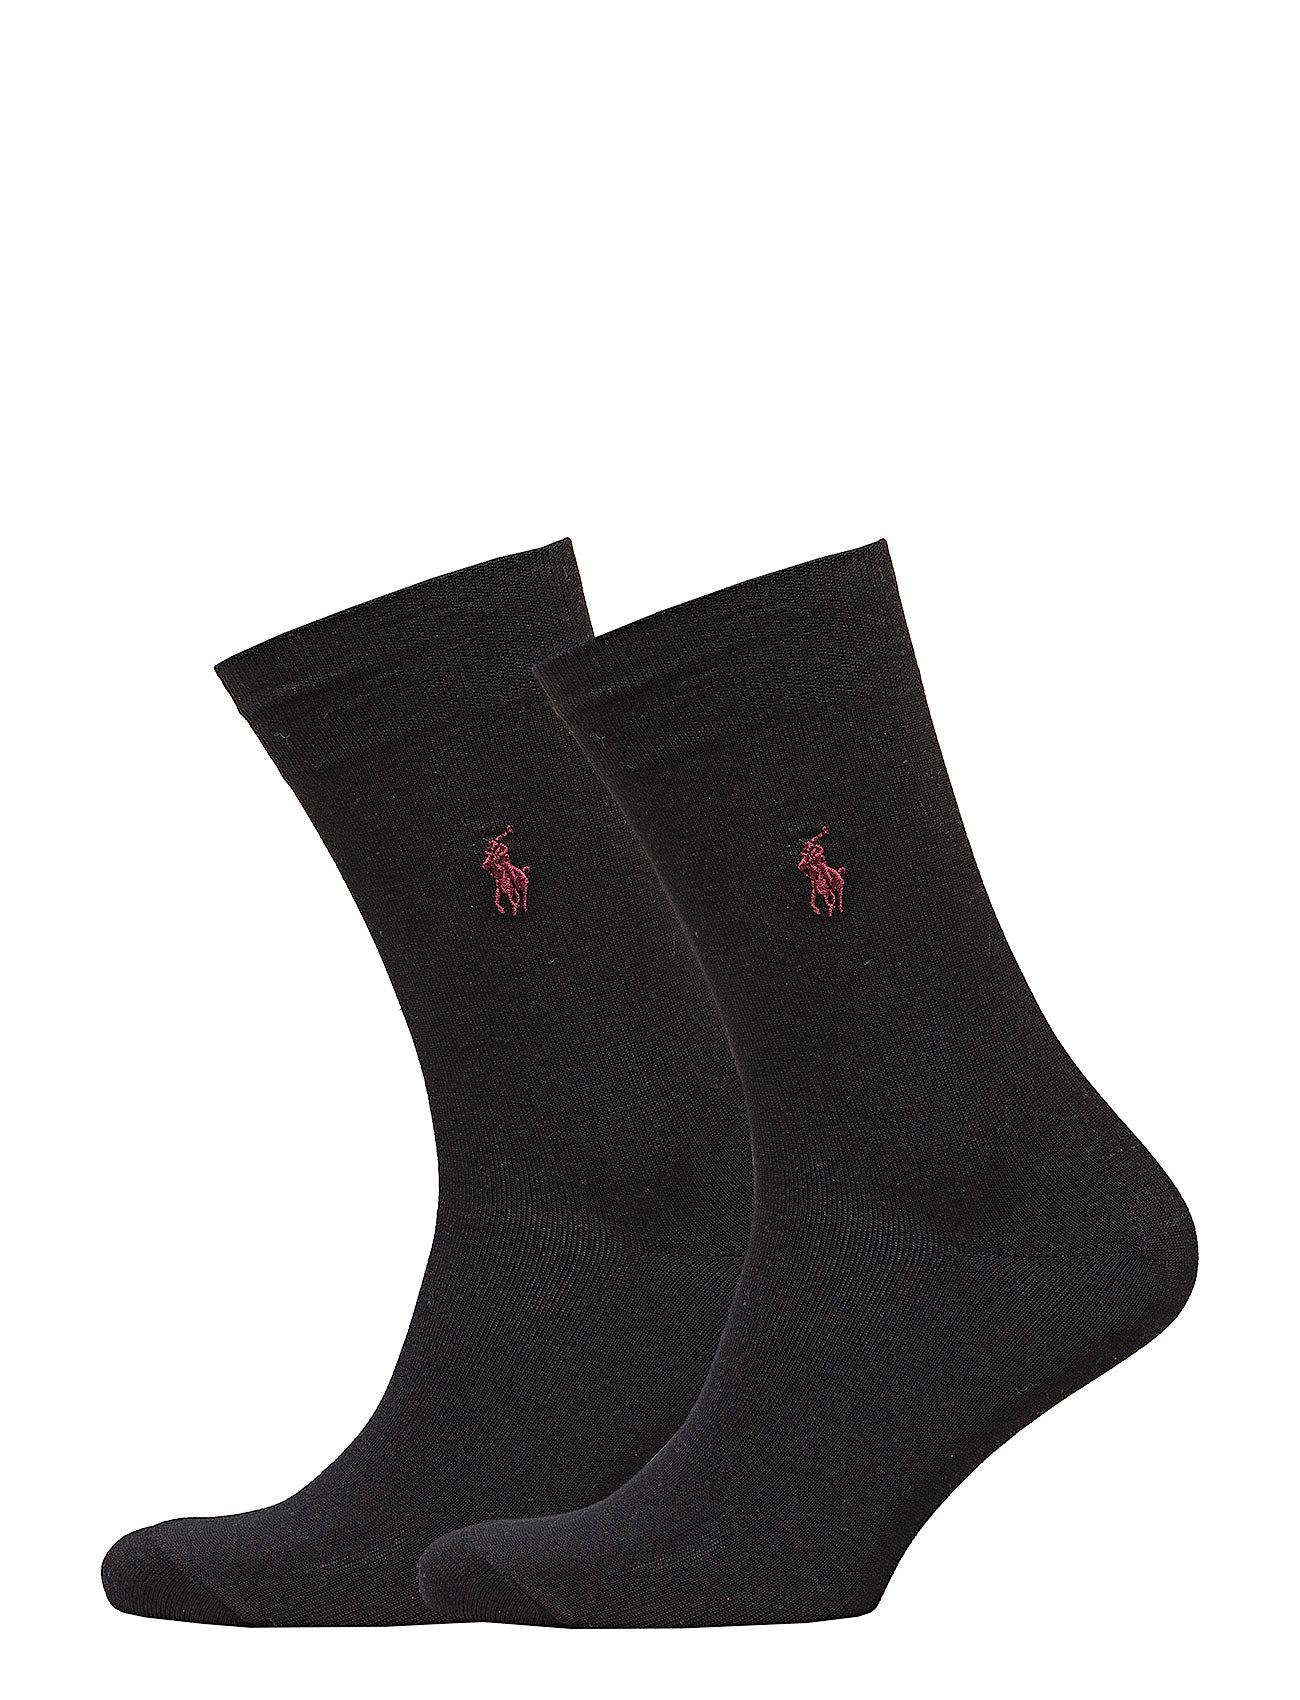 Polo Ralph Lauren Underwear SCK SIZED 2 PK MERC CTN FLAT K - NEW BLACK